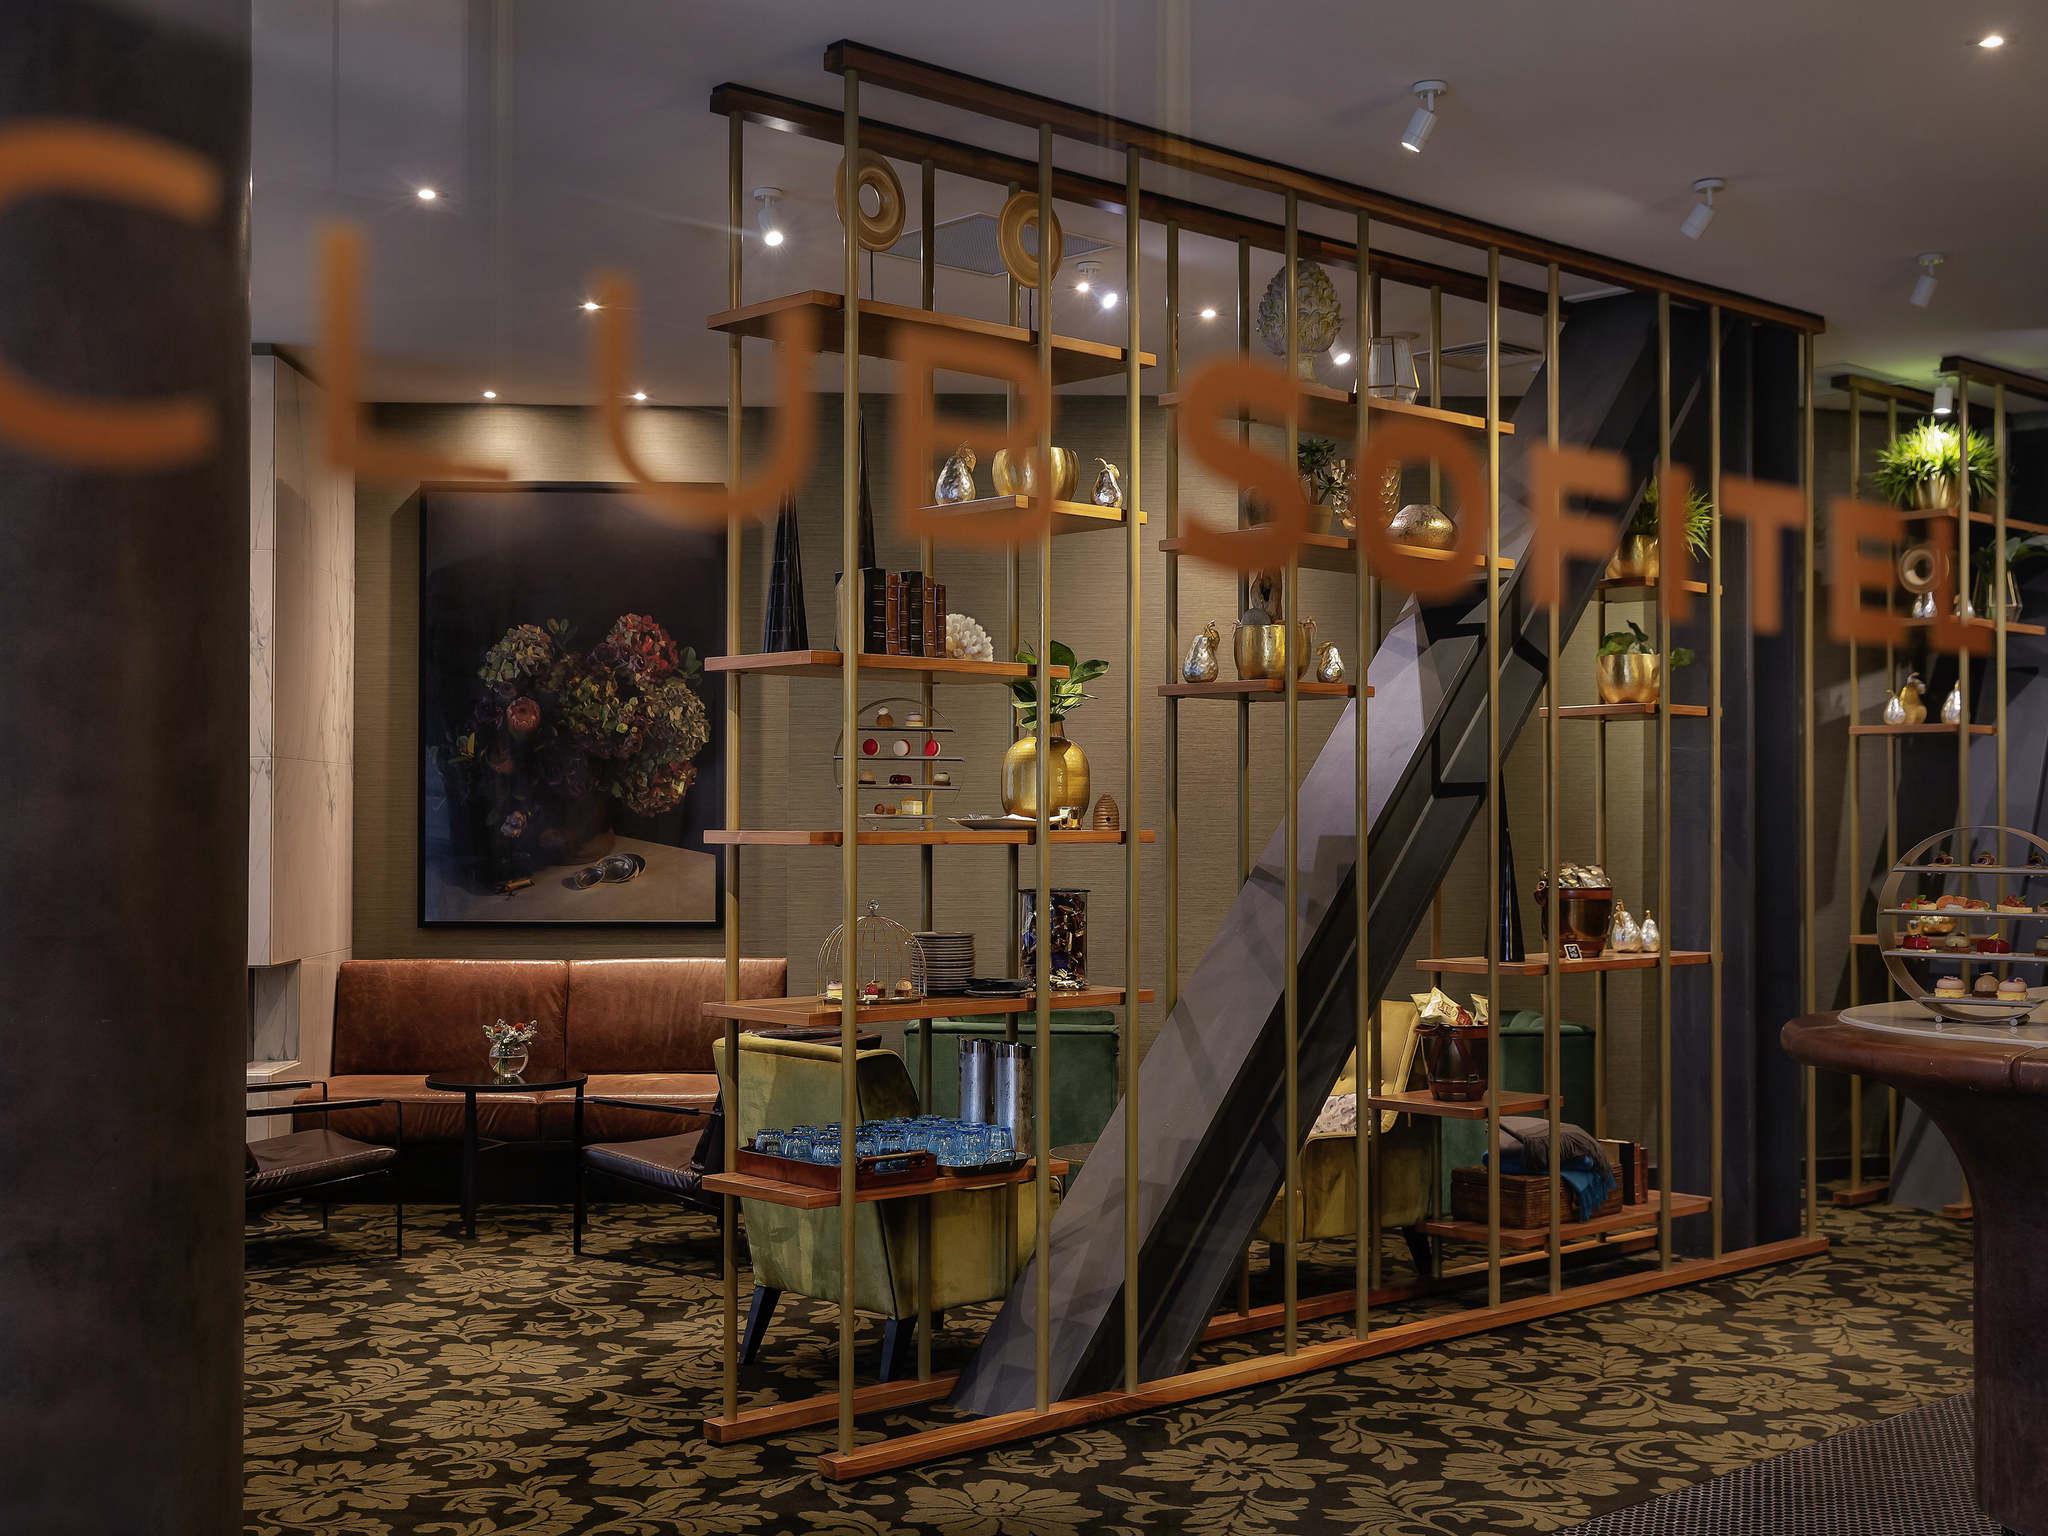 sofitel wellington - luxury hotel accommodation in wellington's cbd